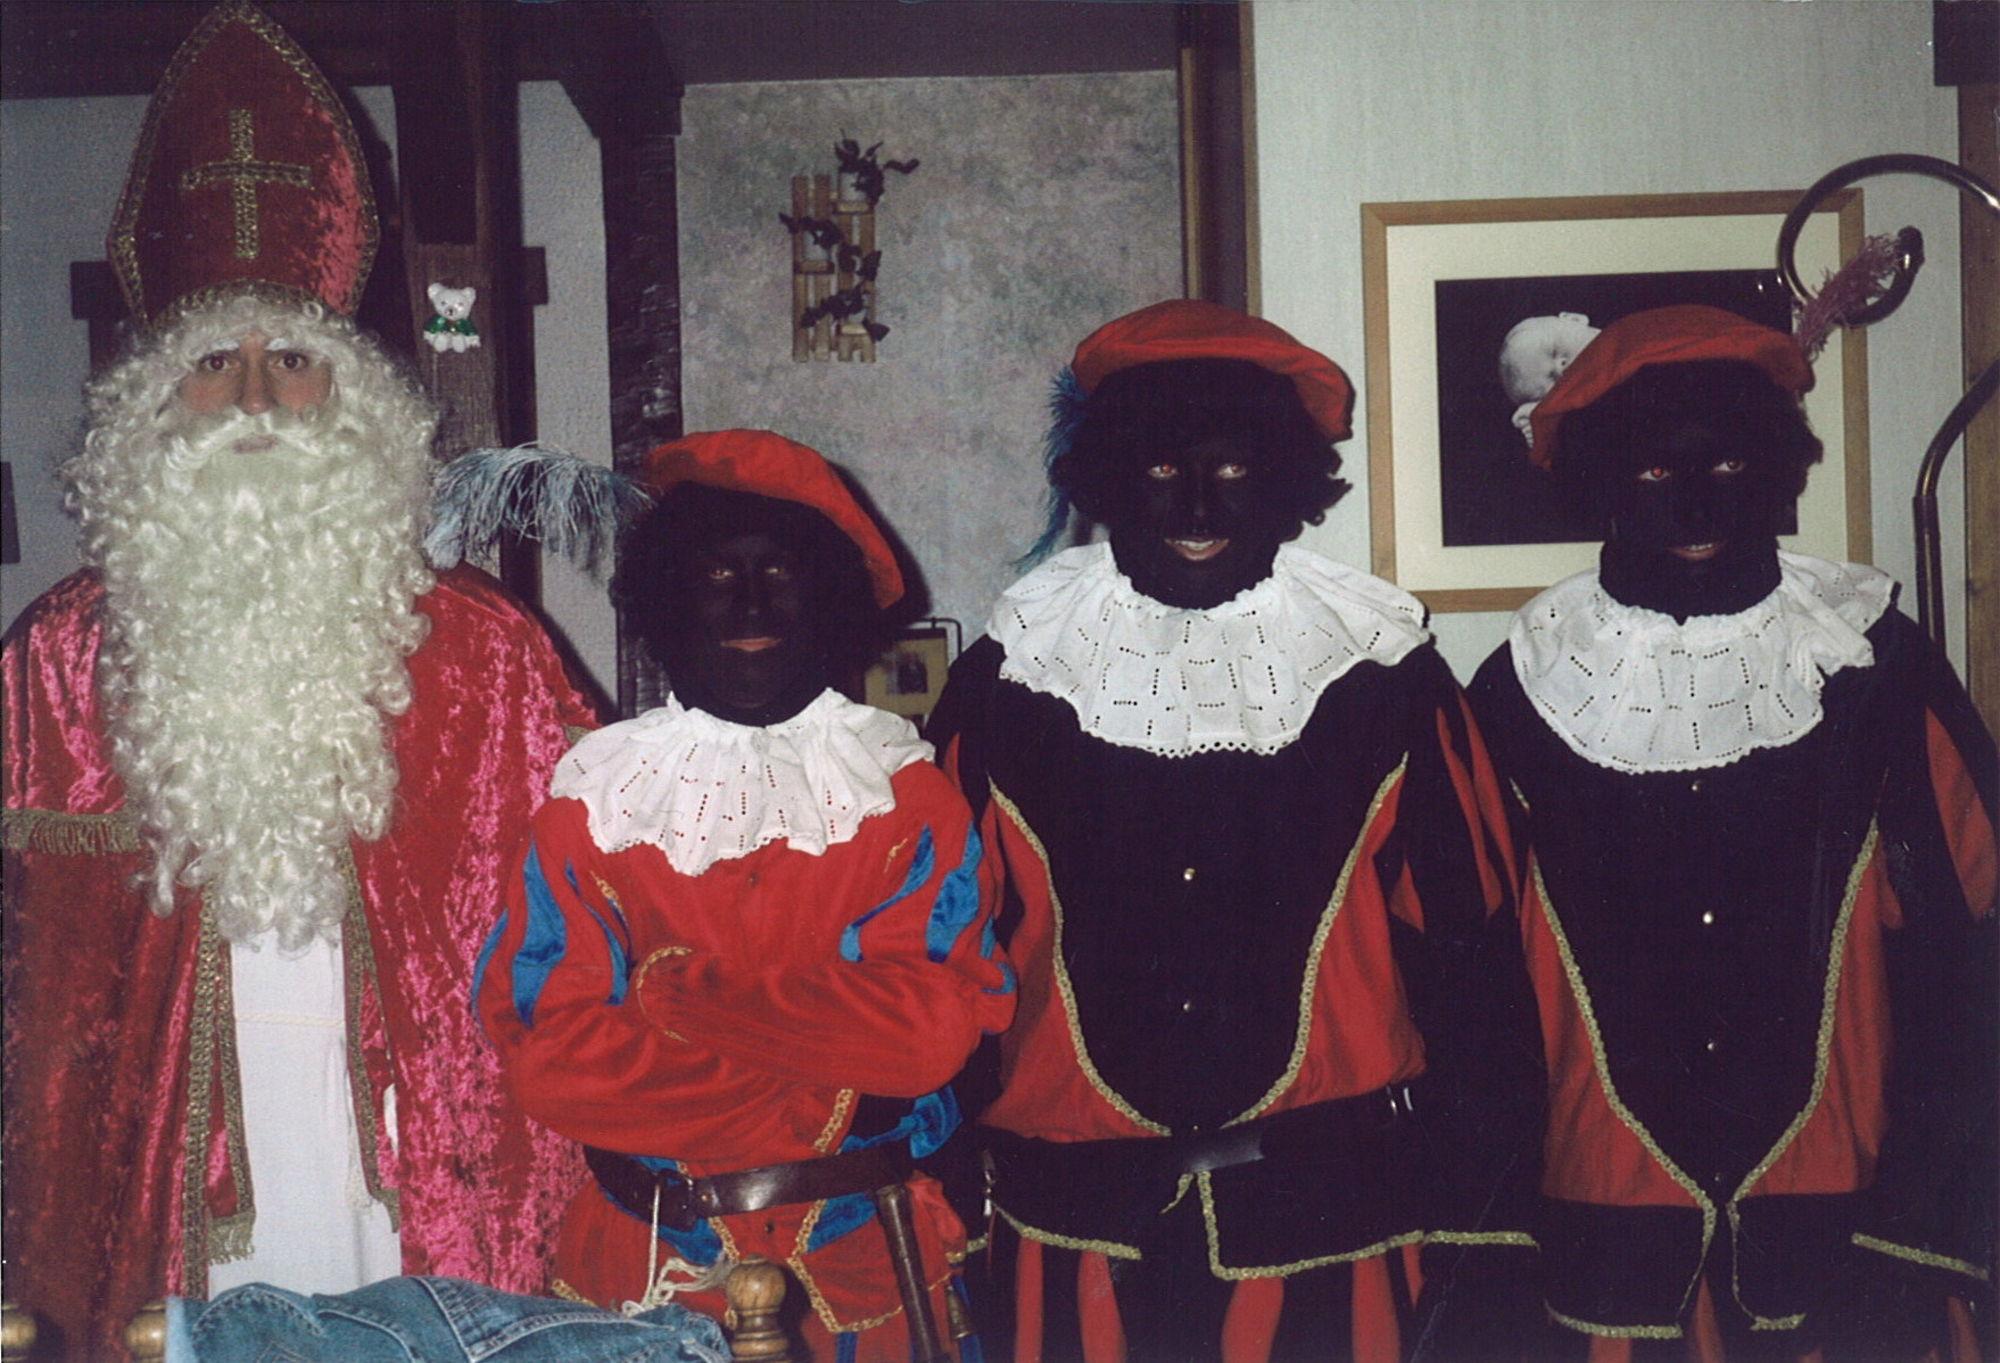 Martin Dusselier speelt Sinterklaas in Marke